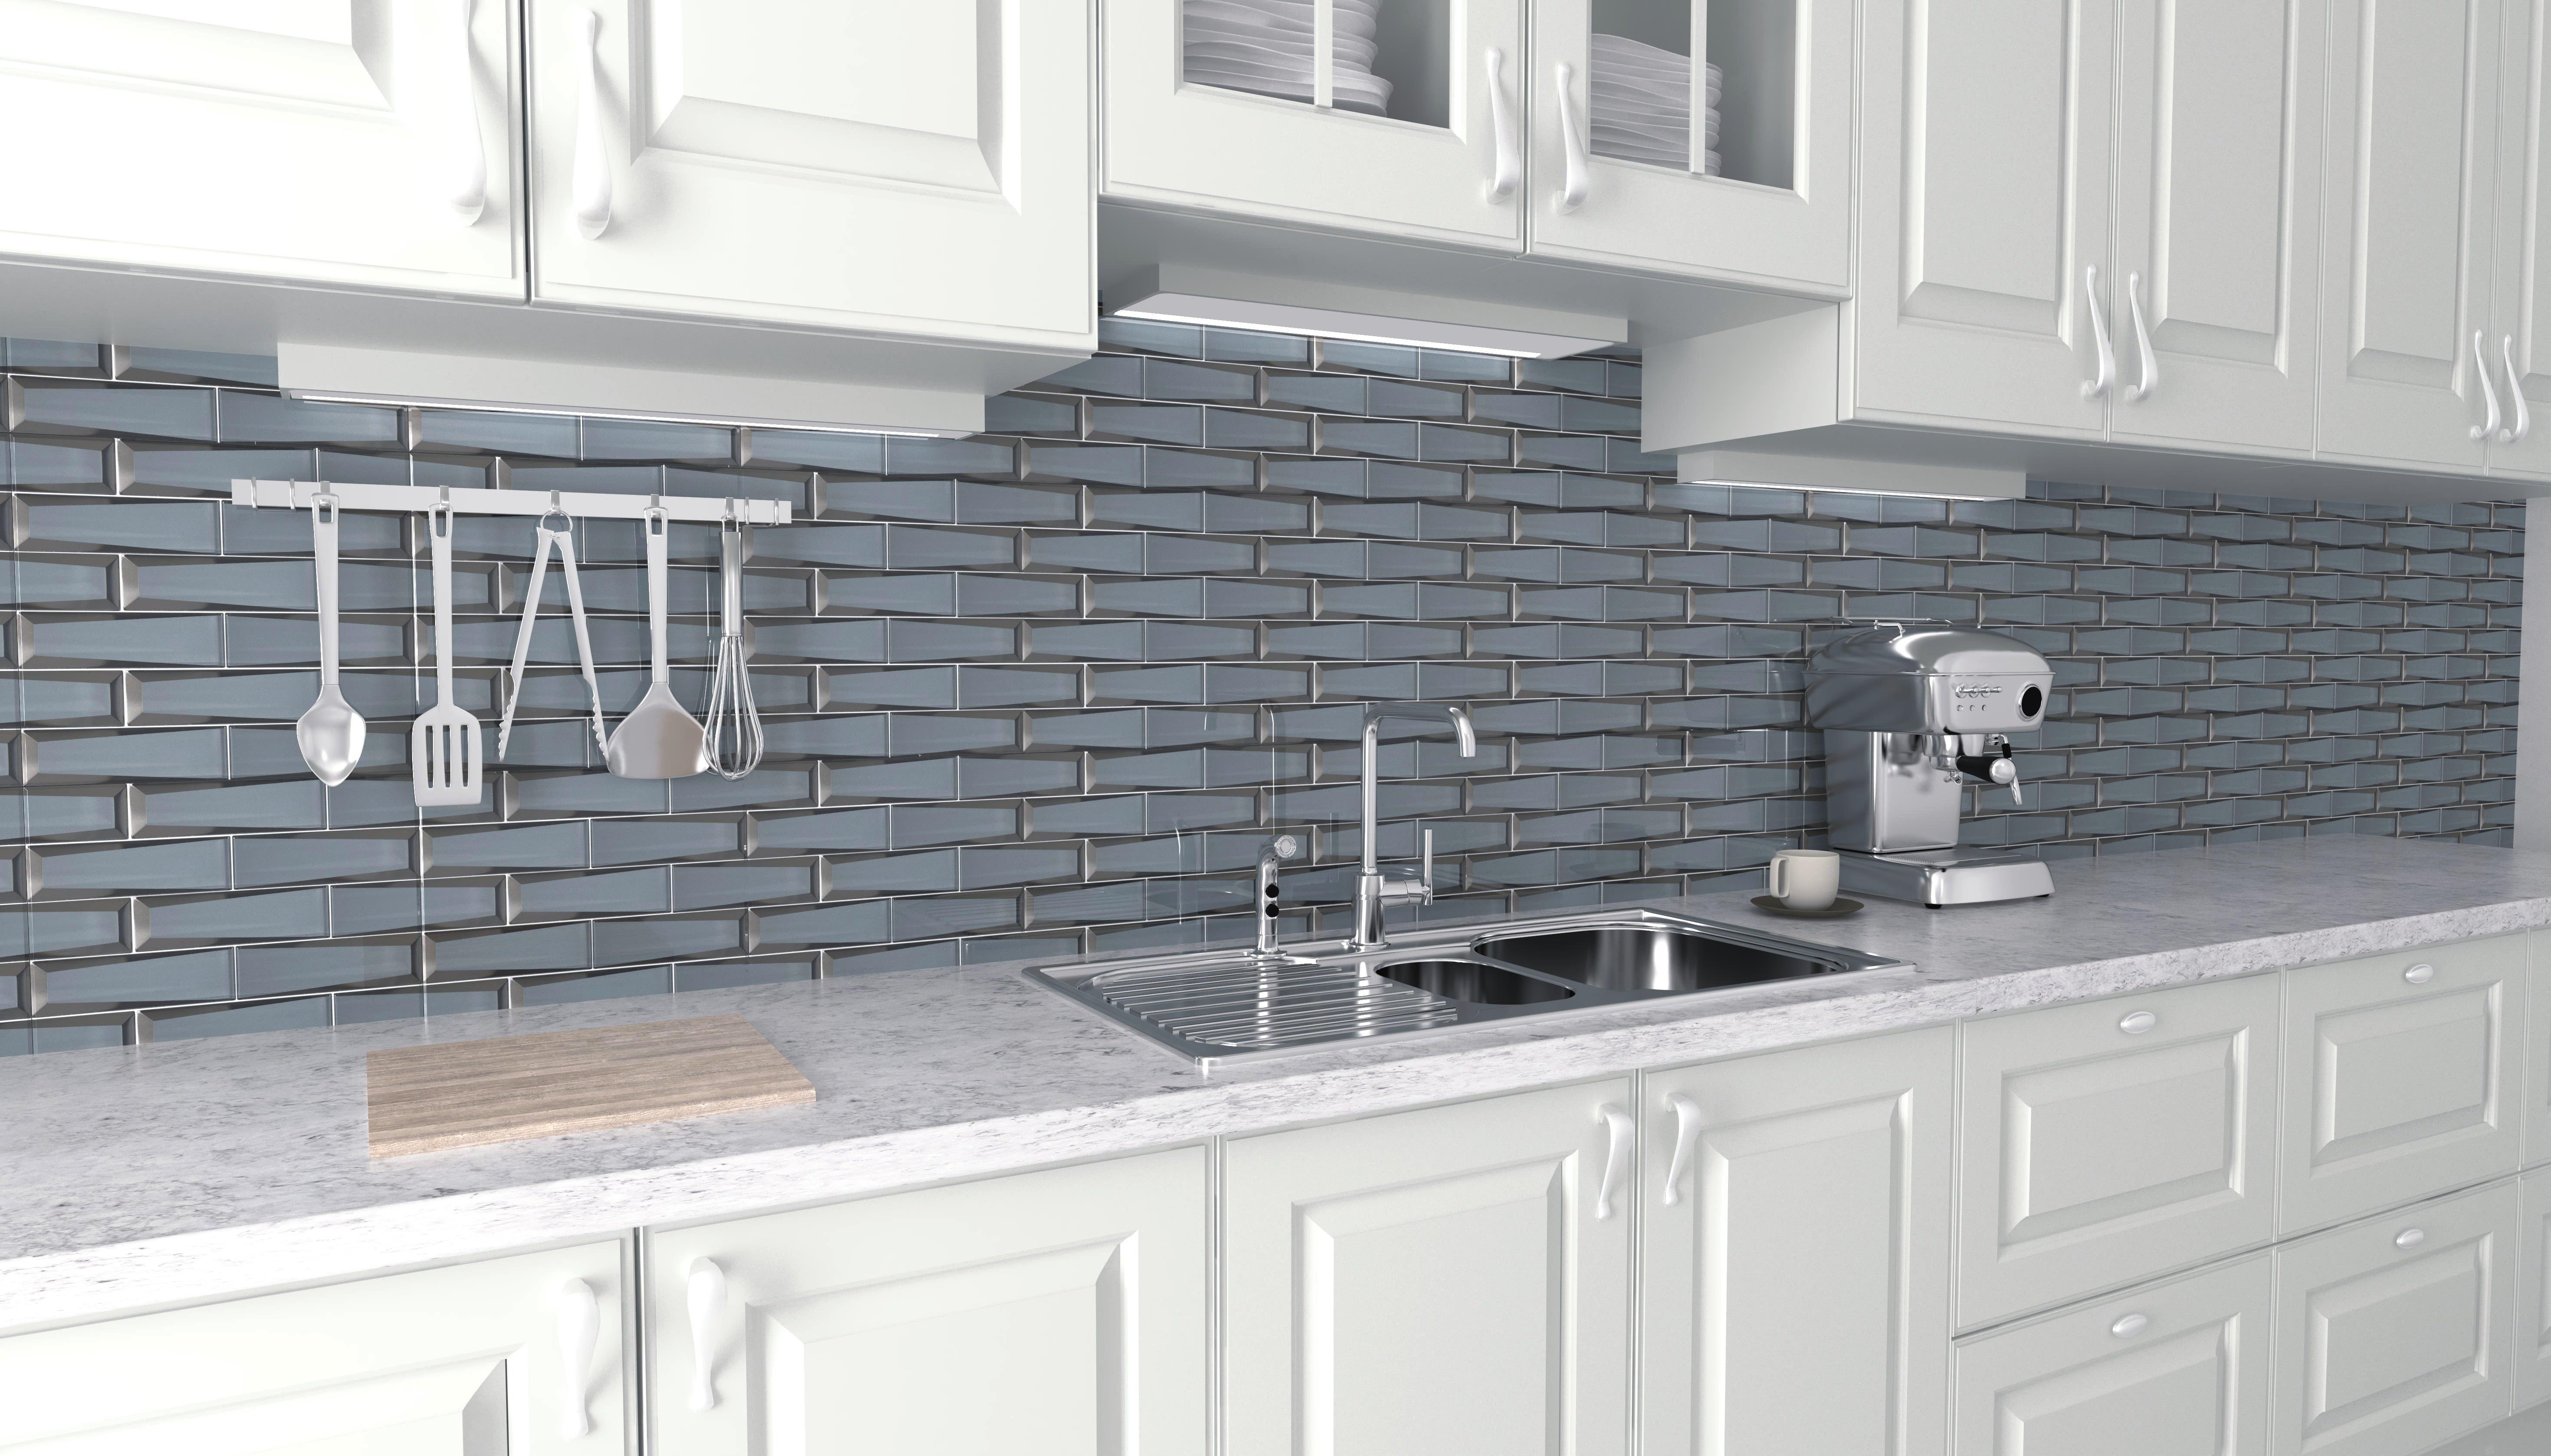 beveled glass tile backsplash to add style and interest to